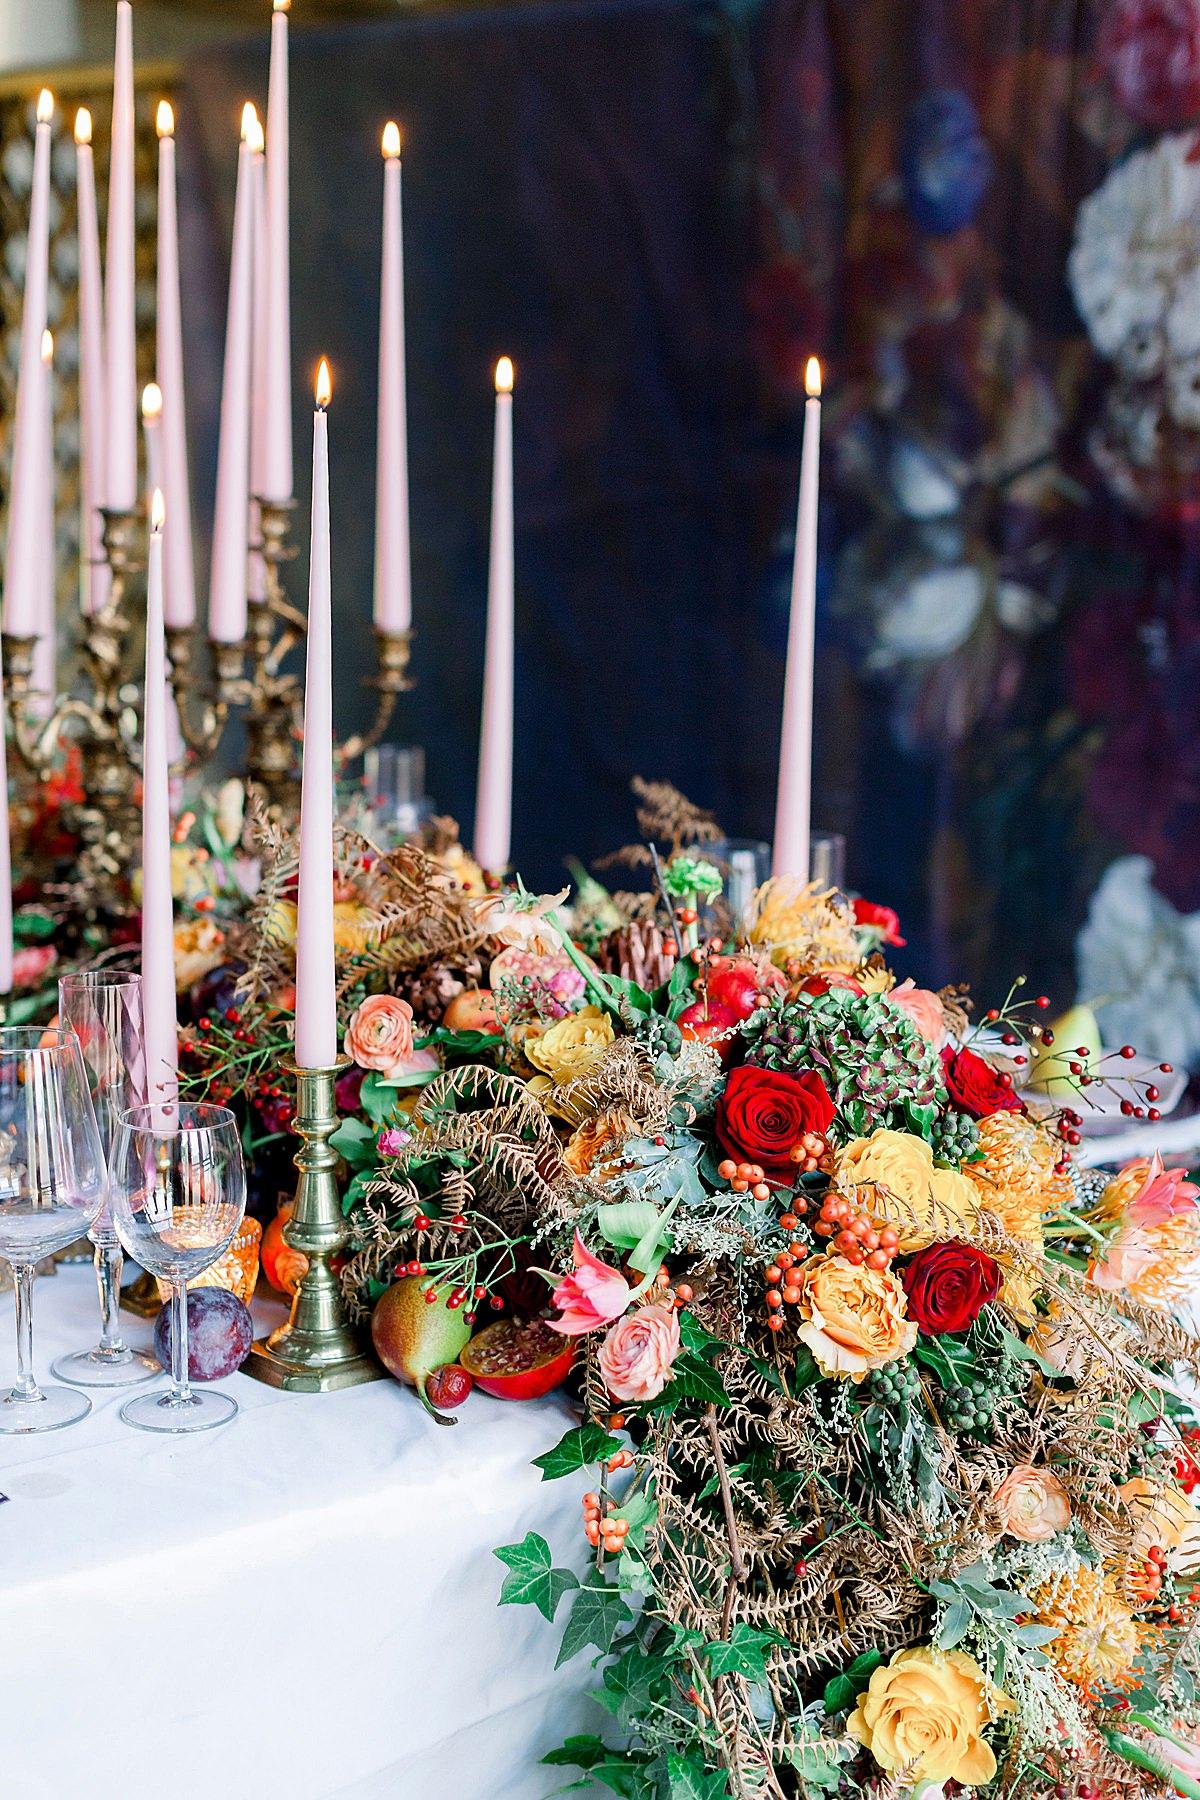 Briar-Rose-tablescape-tapestry-backdrop (33).jpg